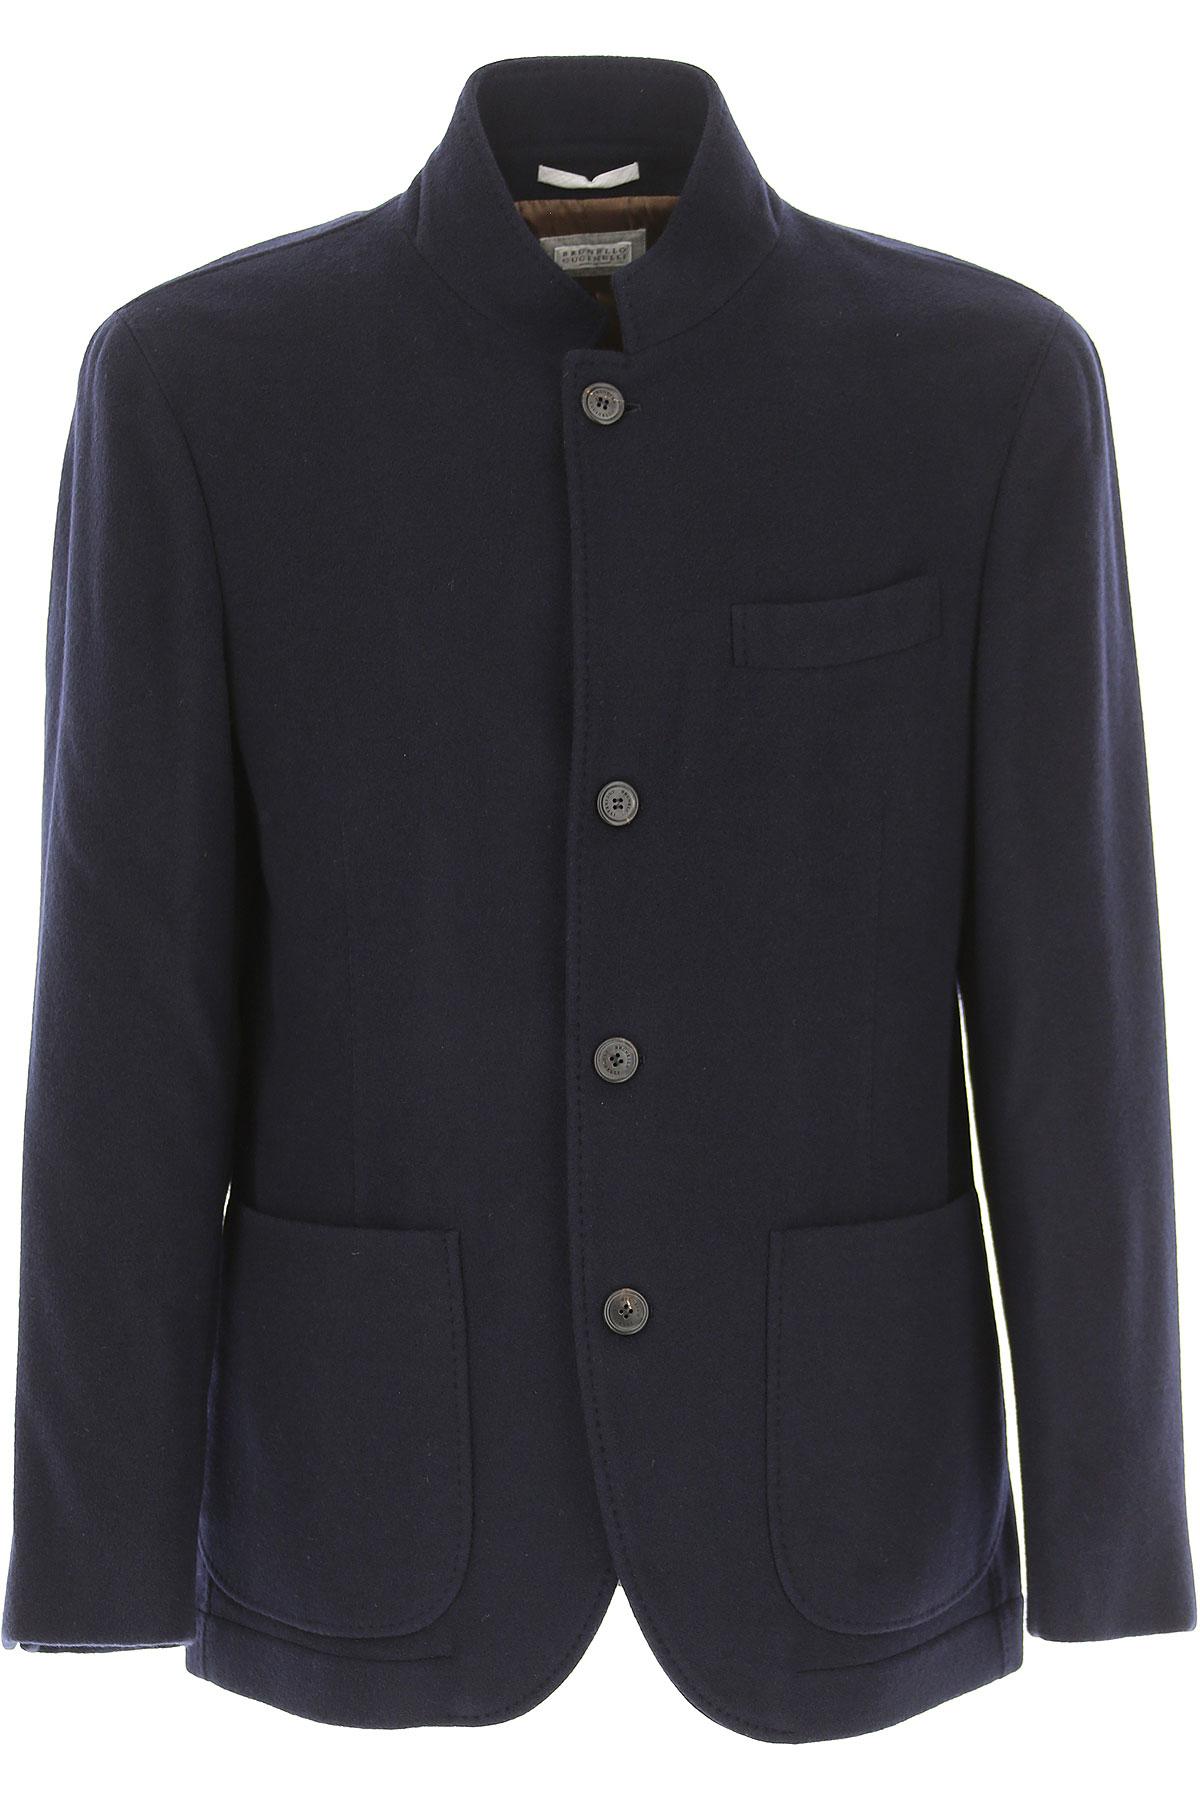 Image of Brunello Cucinelli Men\'s Coat, Navy Blue, Cashemere, 2017, L M S